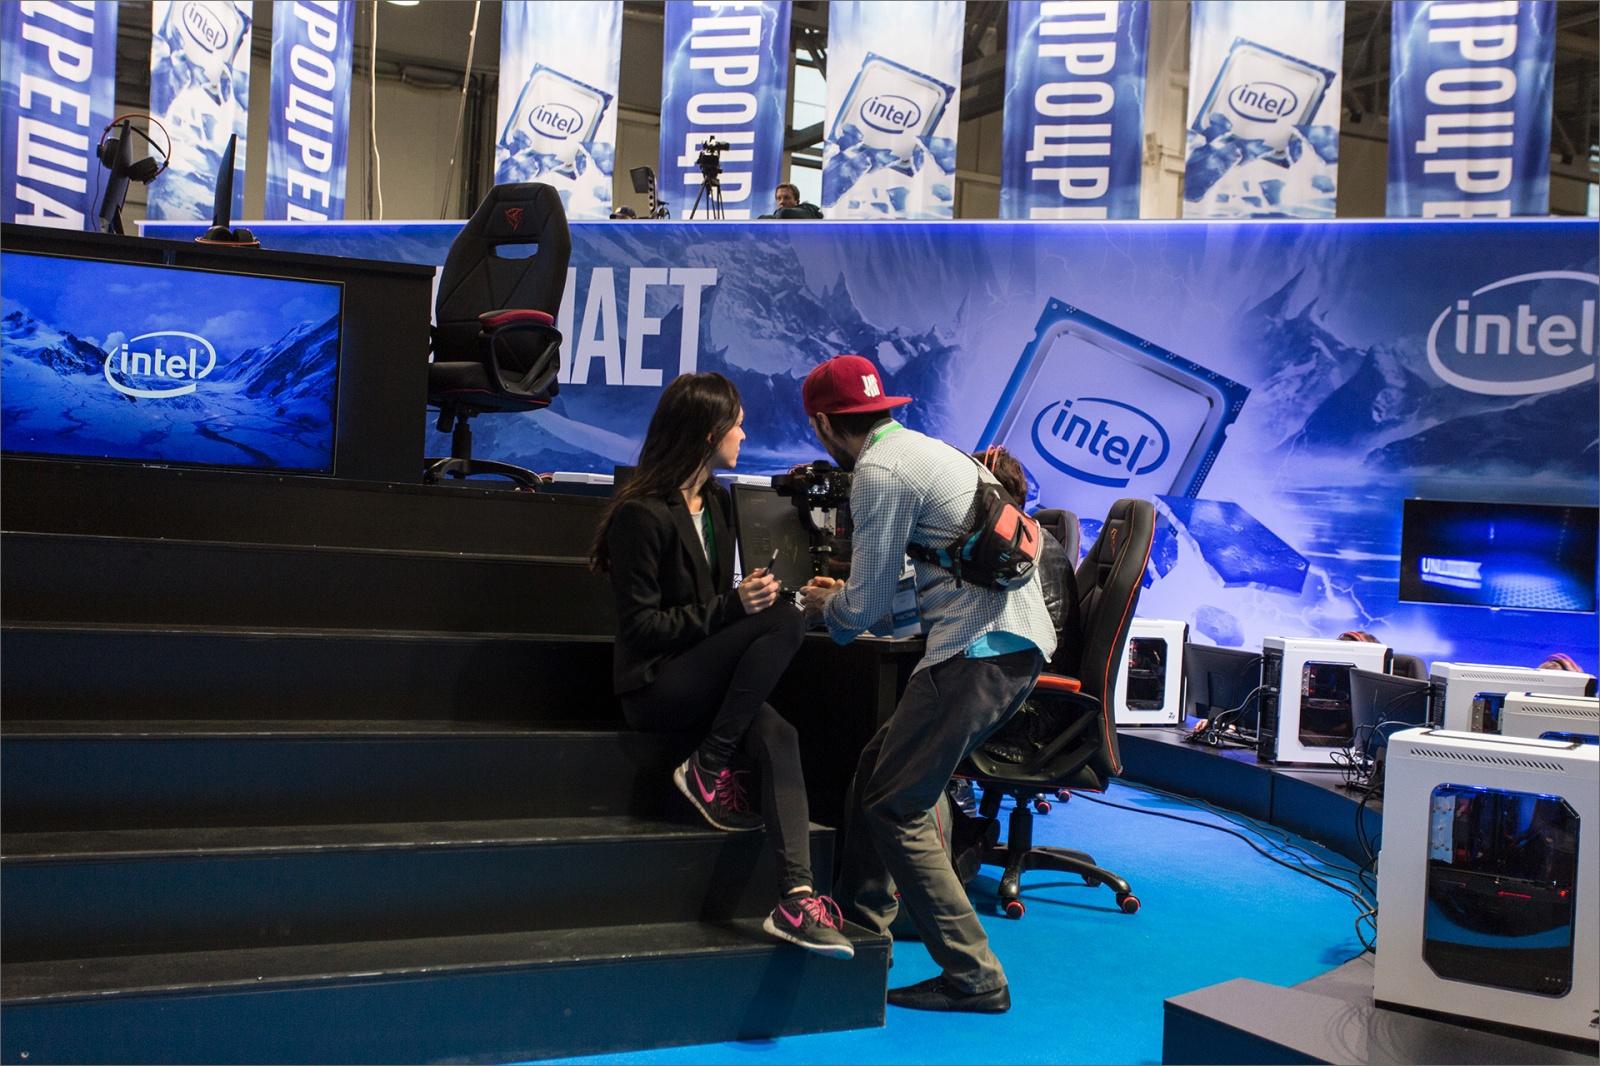 Intel значит побеждать: захват игромира прошёл успешно - 18